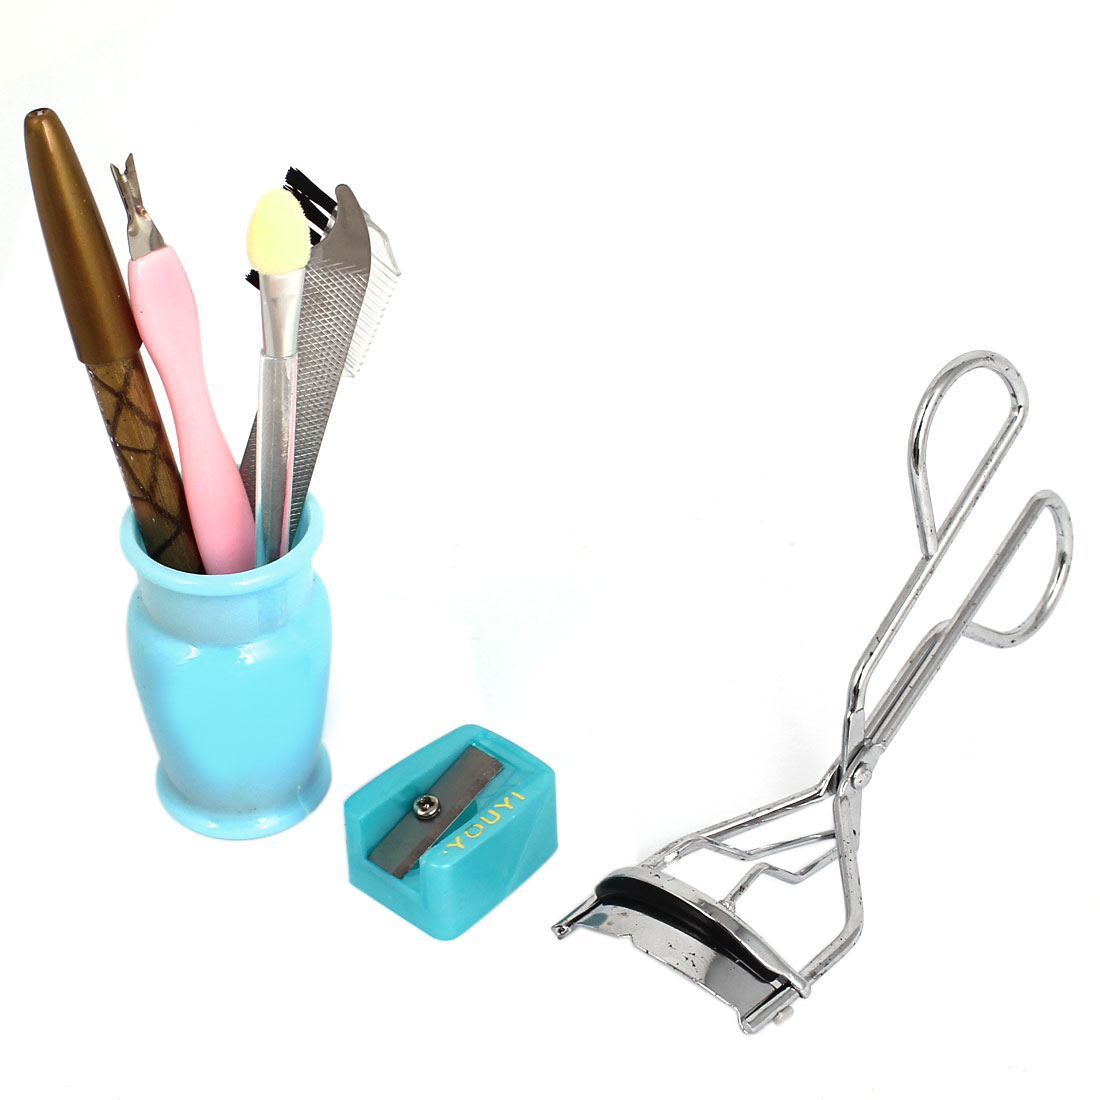 7 in 1 Beauty Tool Set Eyebrow Curler Comb Pencil Eyeshadow Applicator